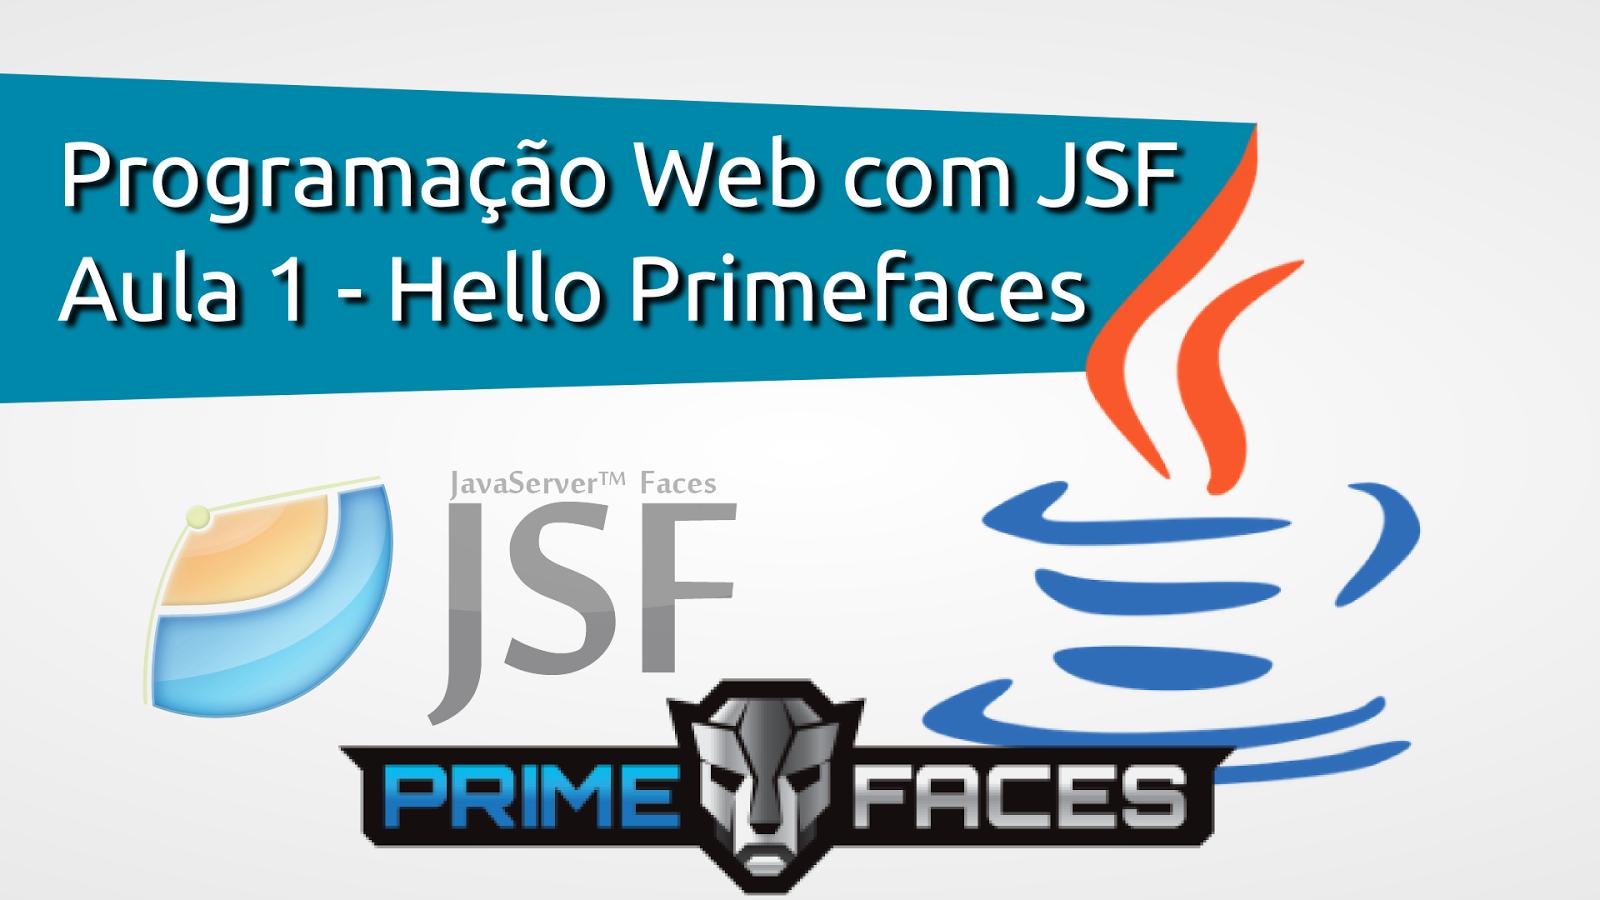 Aula 1 - Hello Primefaces